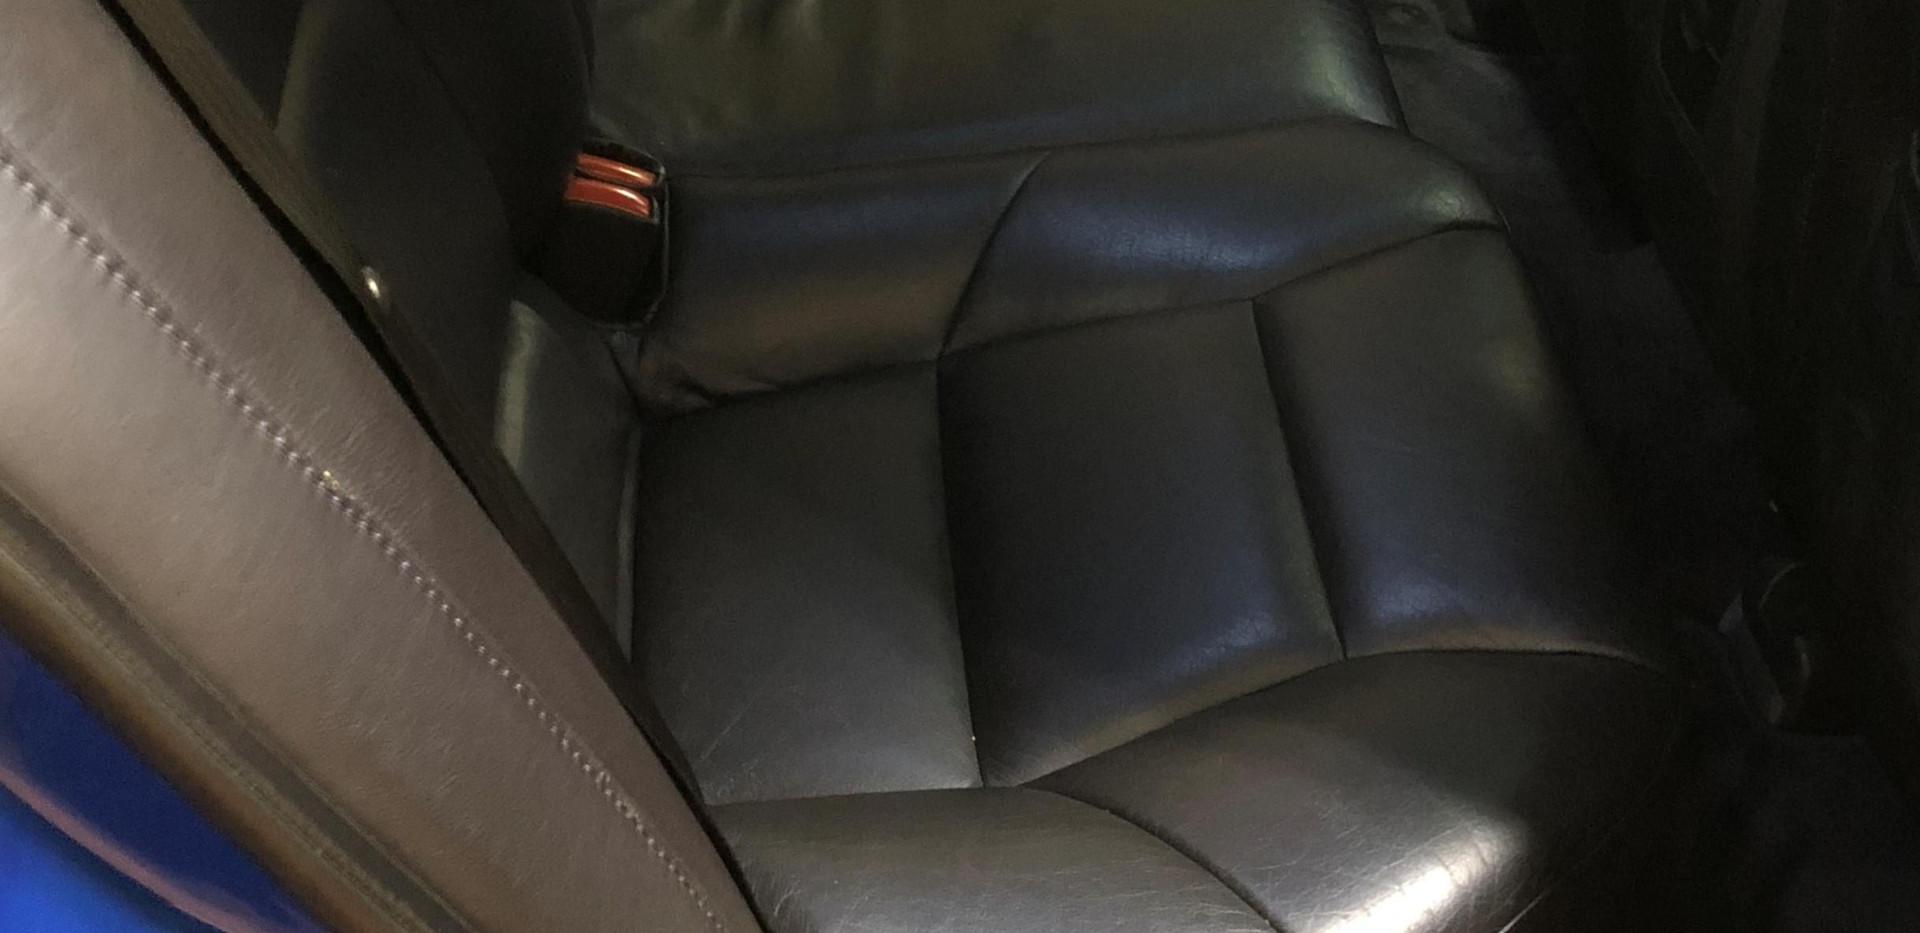 volvo rear seat passenger 47.jpg